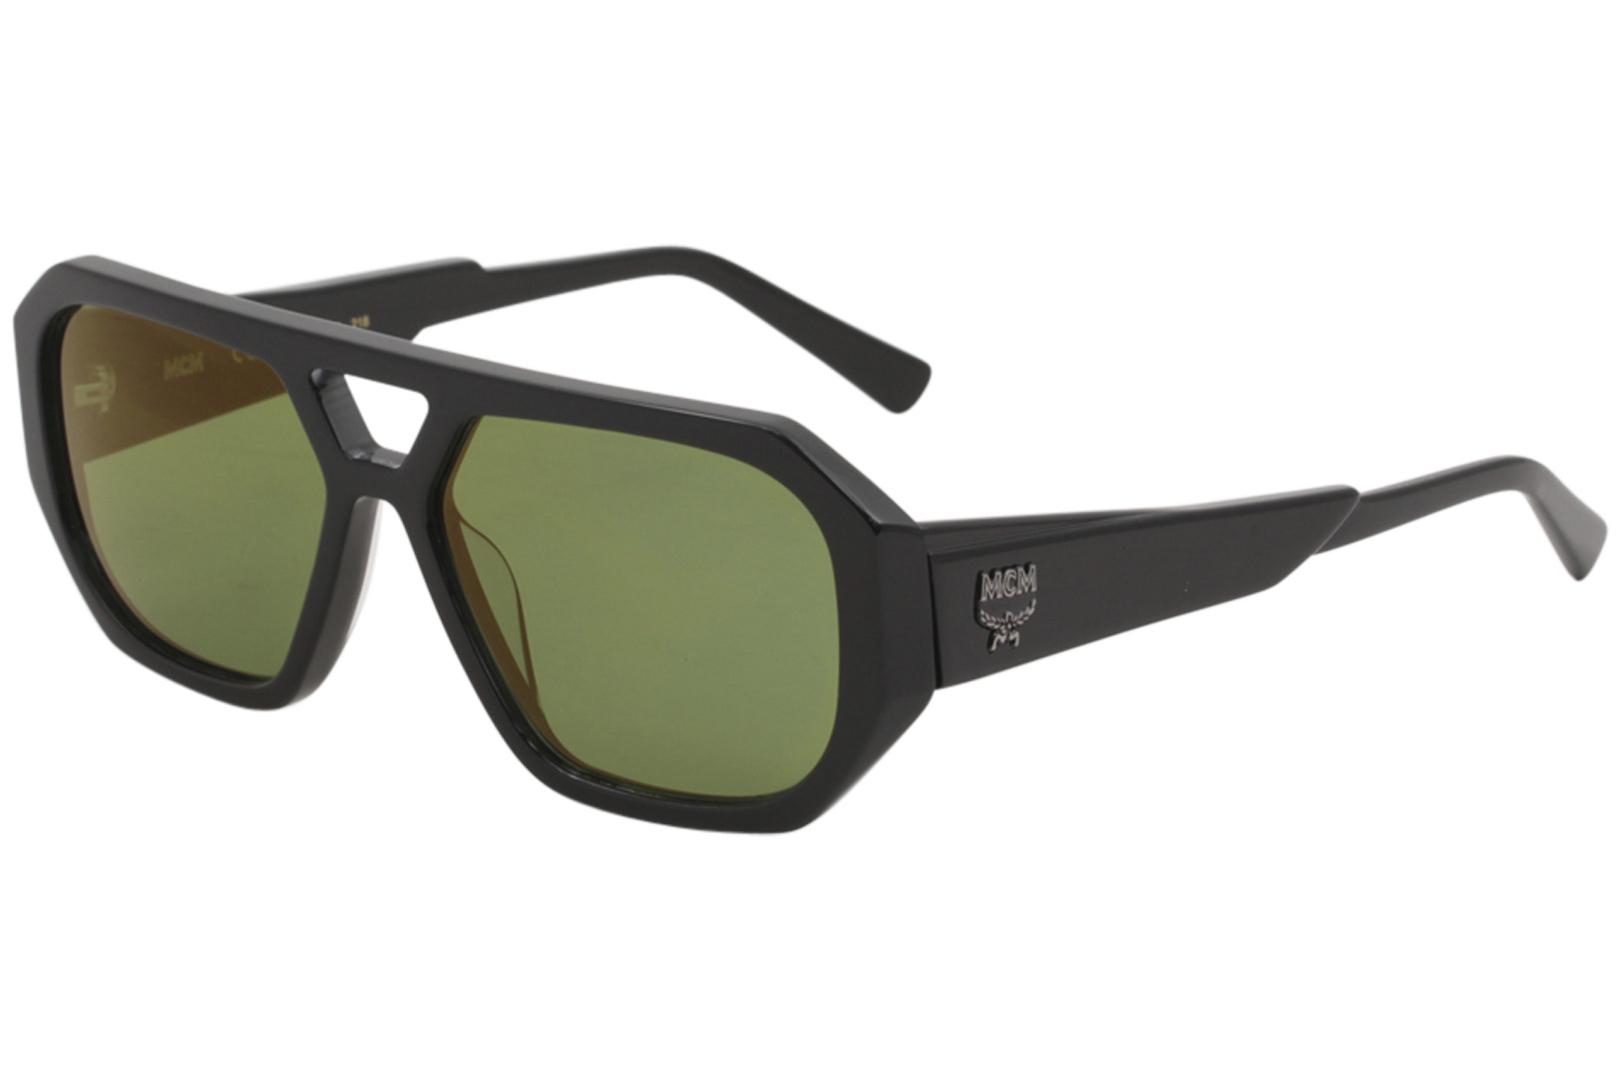 099ab33a98 MCM Women s Sunglasses MCM667S MCM 677 S 001 Black Fashion Pilot ...